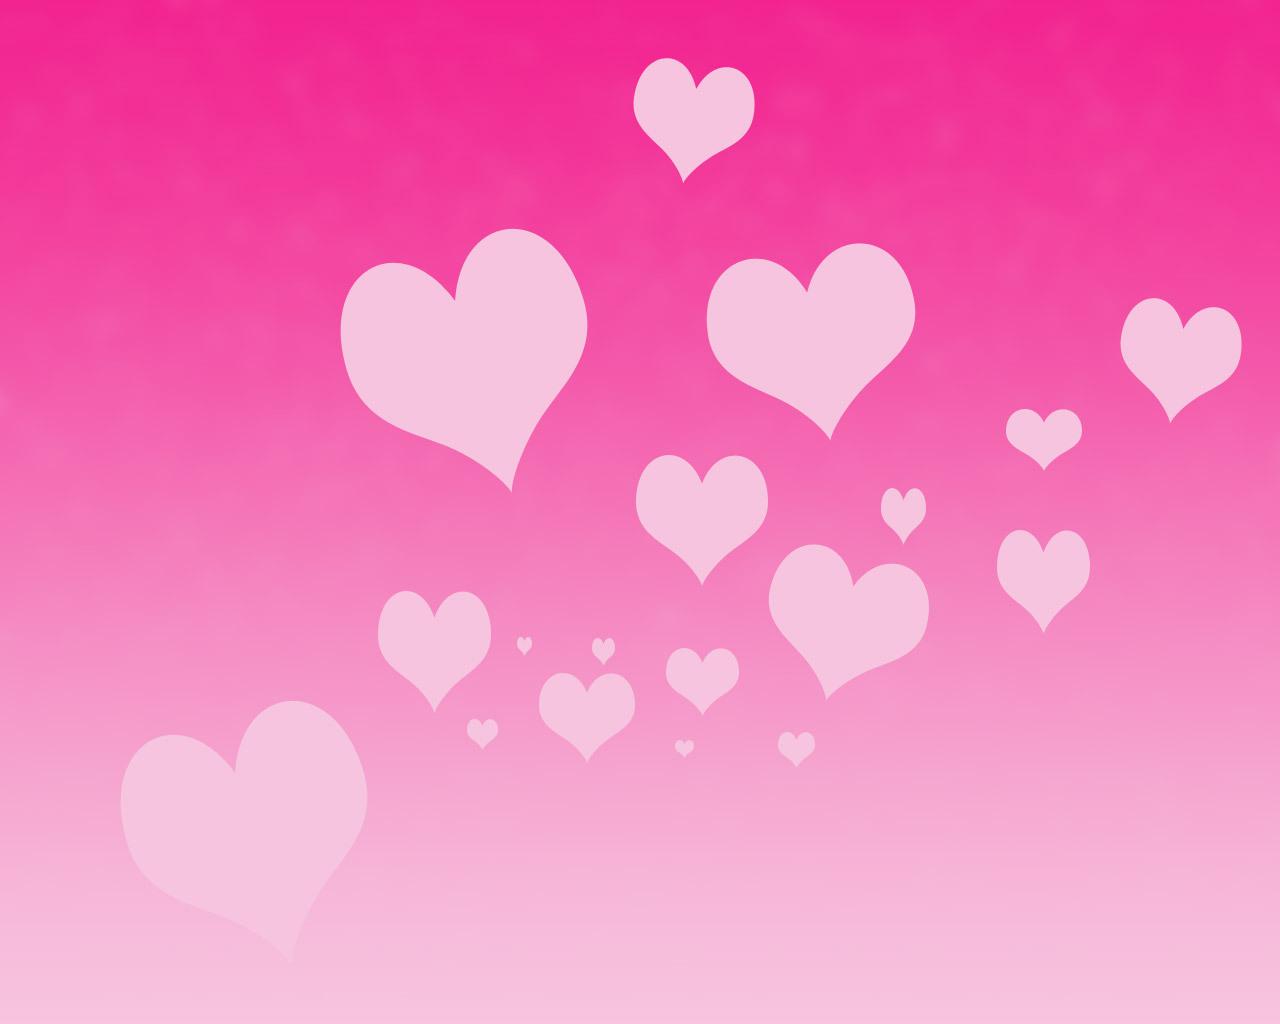 Pink wallpaper   Pink Color Wallpaper 10579408 1280x1024